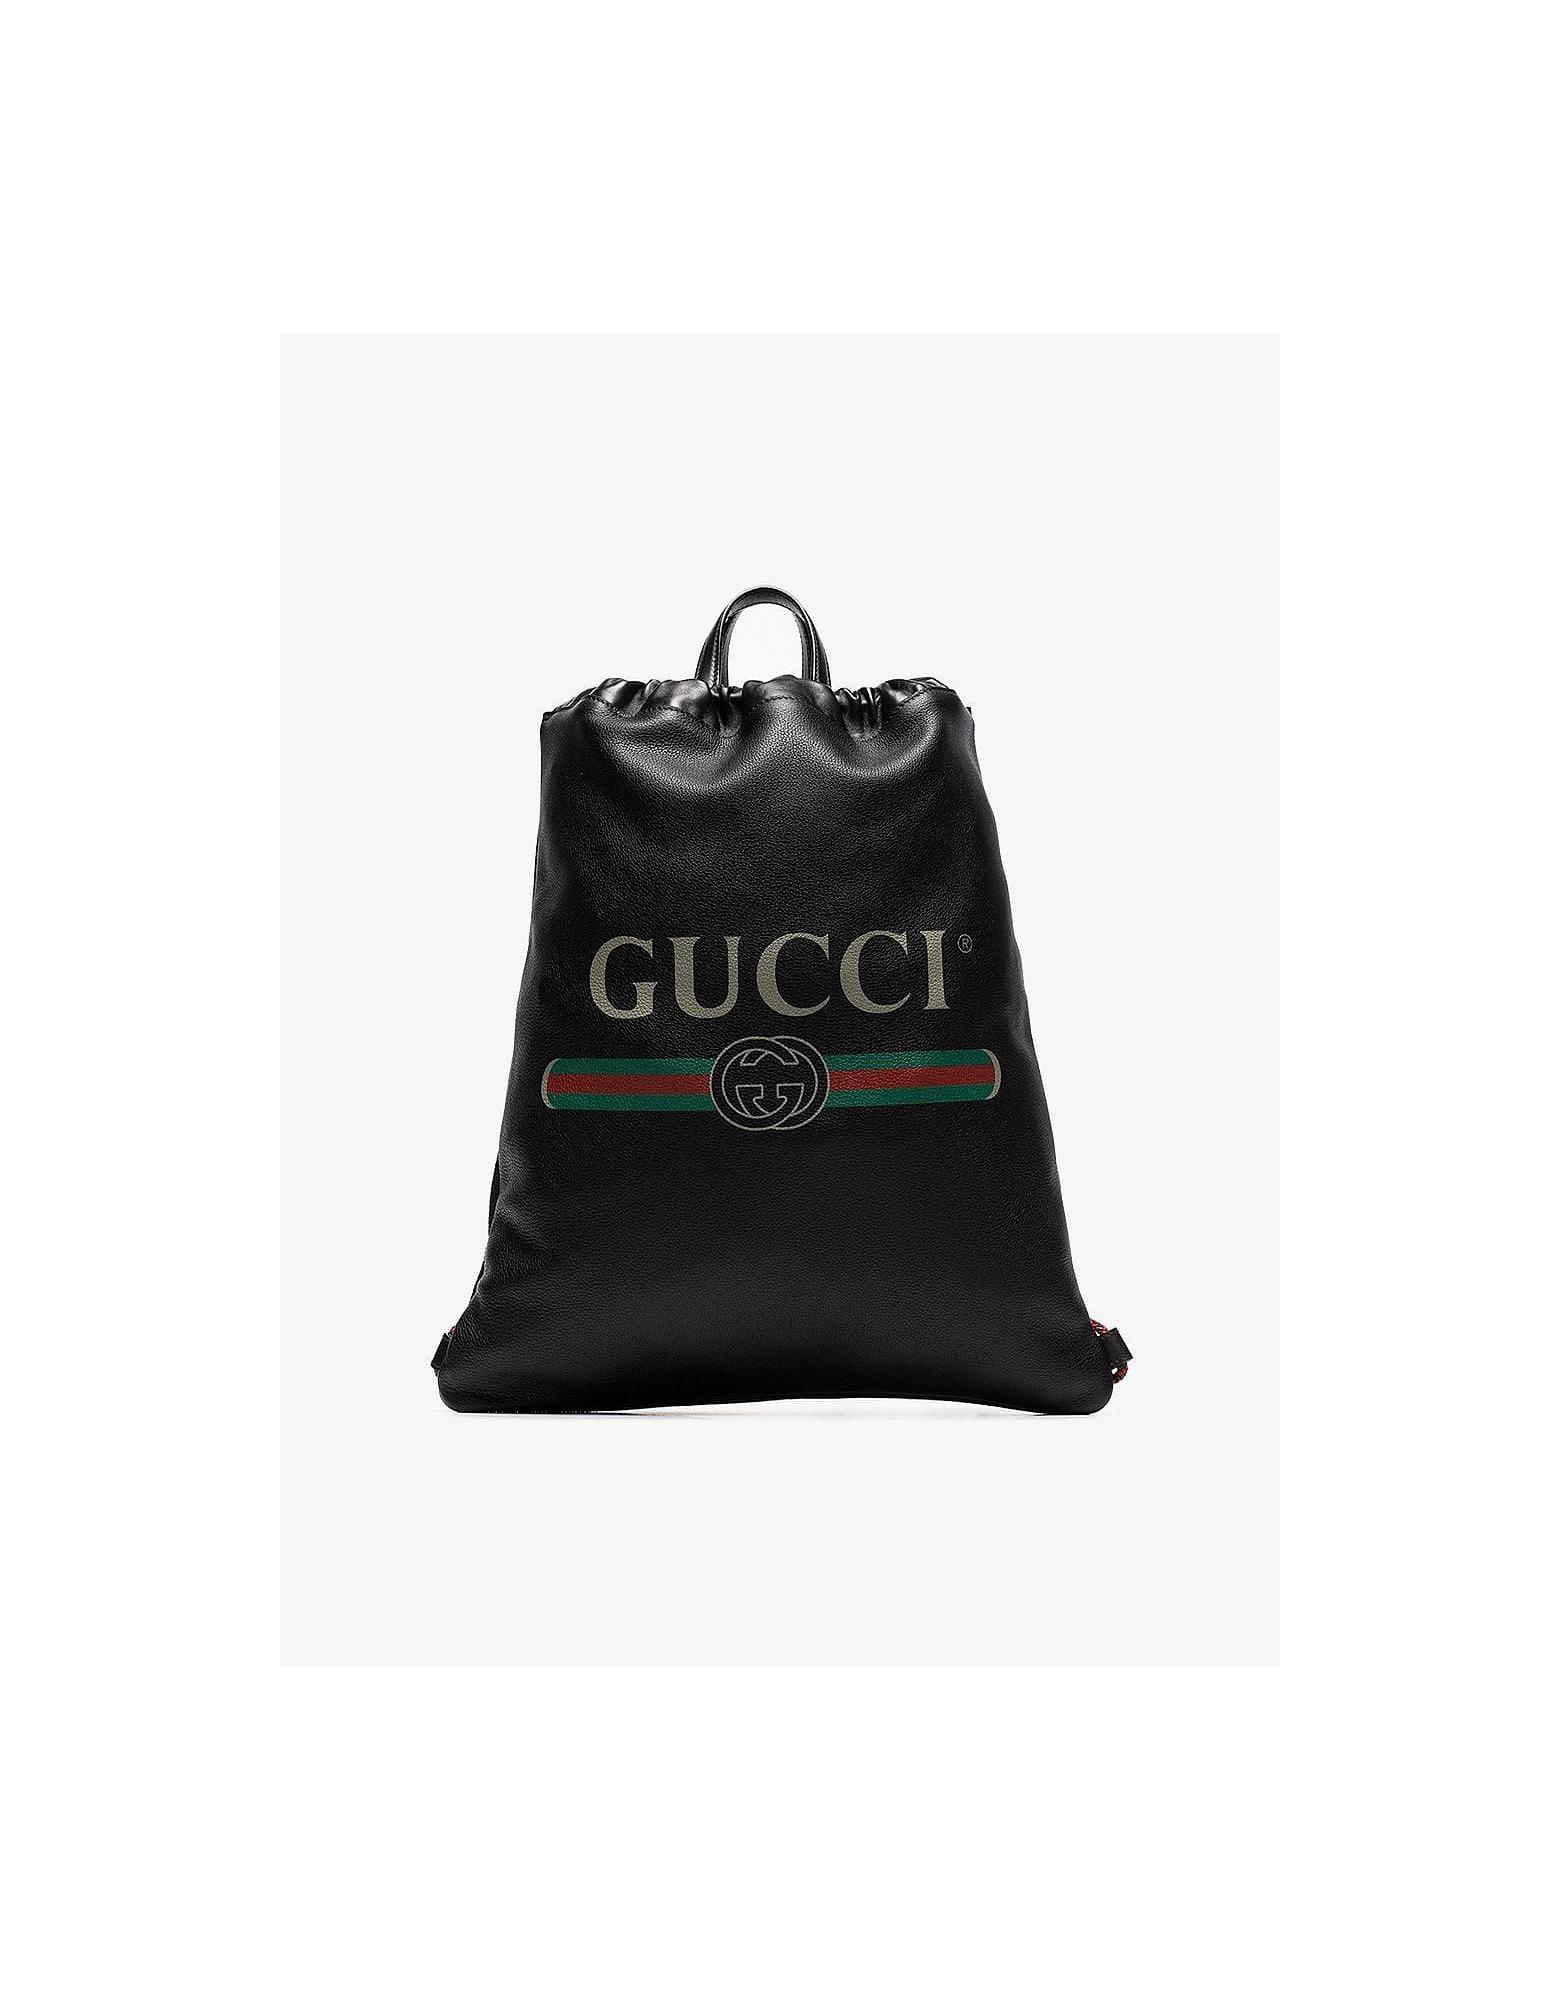 Gucci Backpacks BLACK LOGO PRINT LEATHER DRAWSTRING BACKPACK